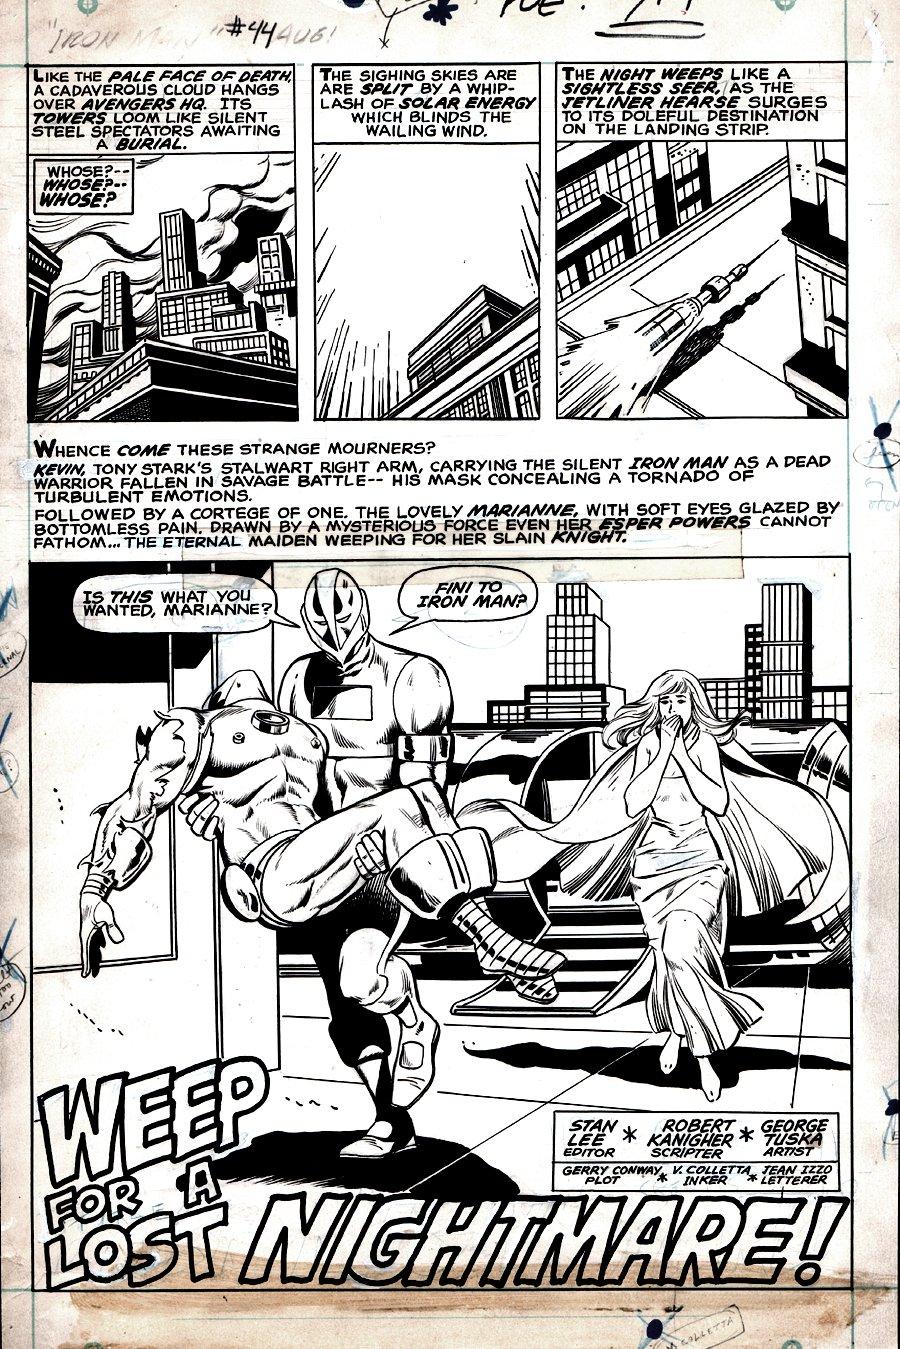 Iron Man #44 p 1 SPLASH (1971)